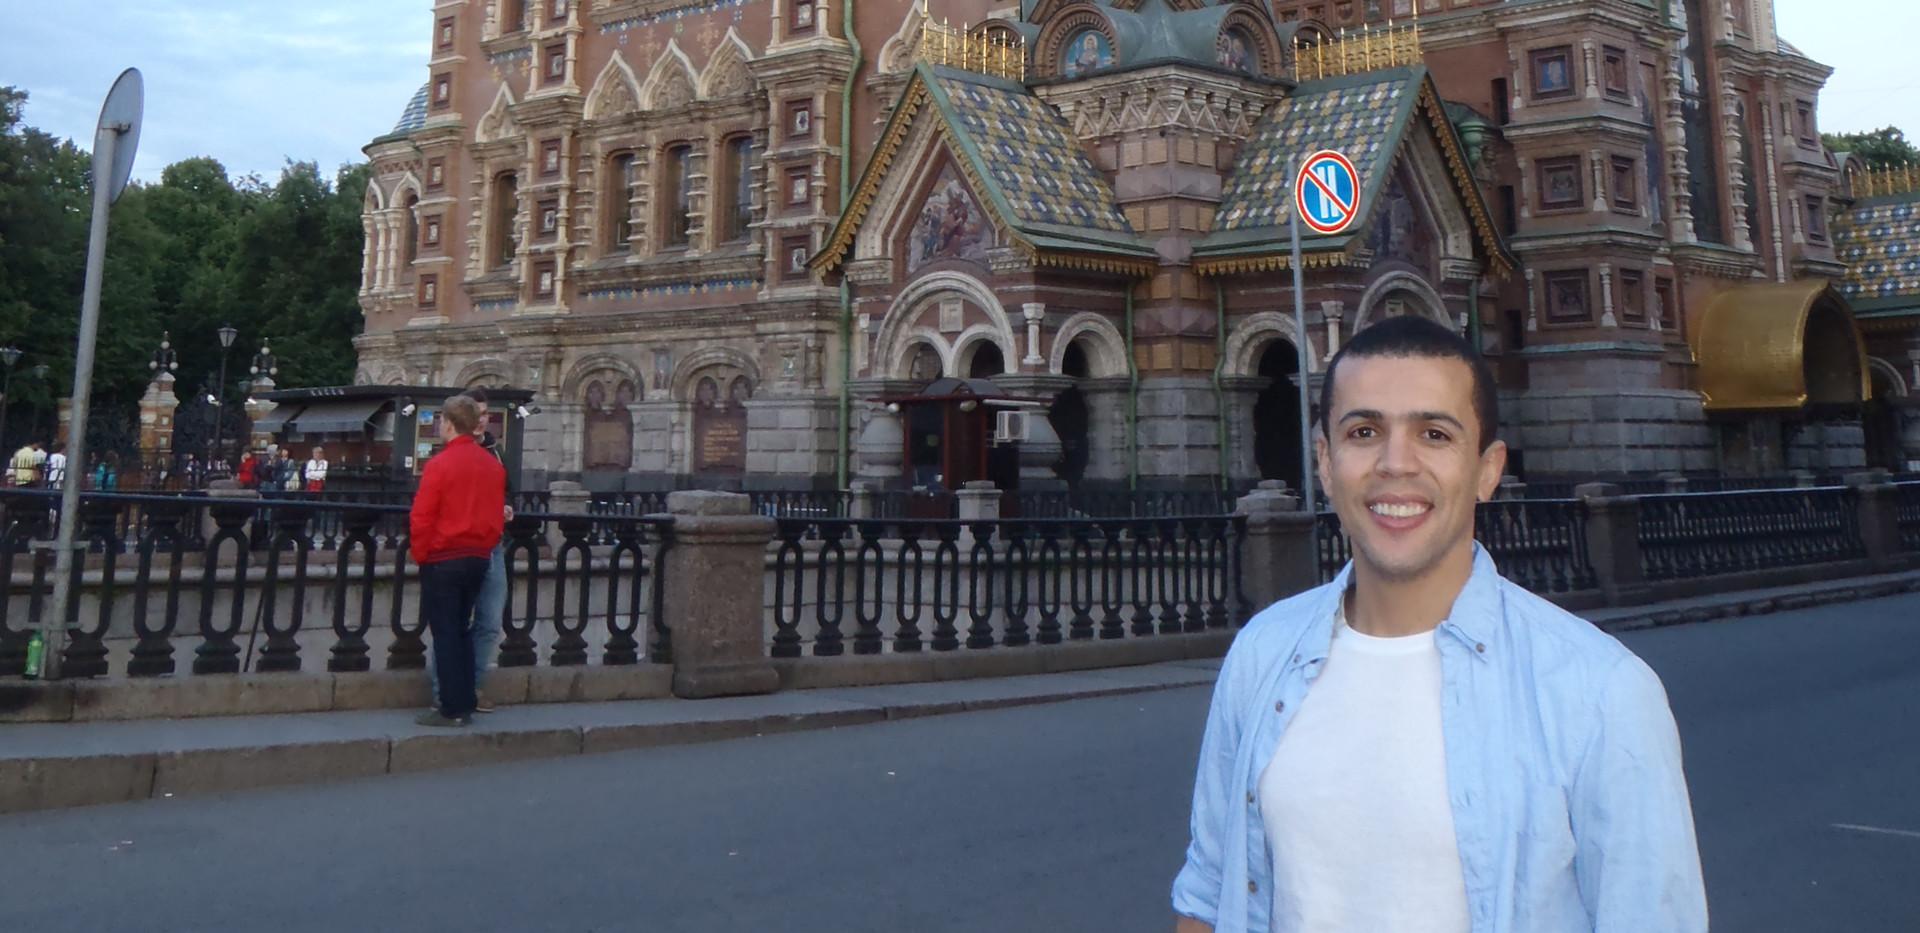 St. Peterburgo-Russia.JPG